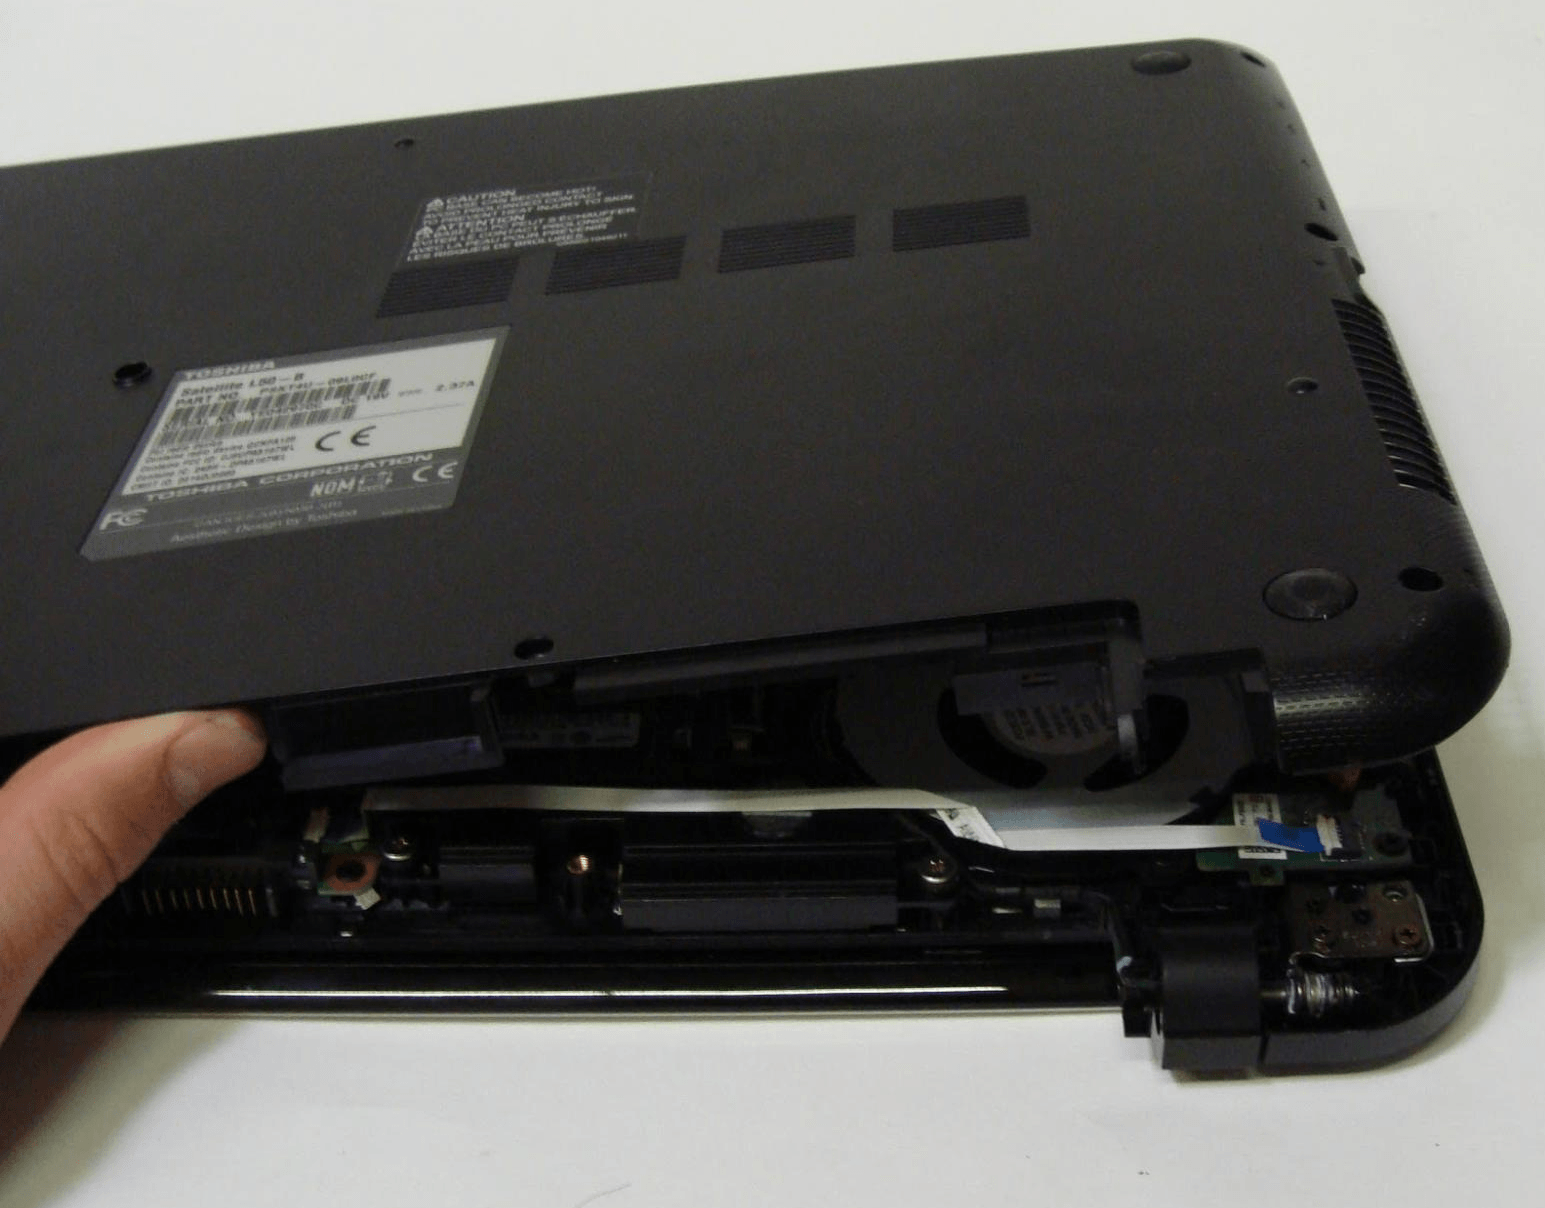 toshiba l50 laptop user manual